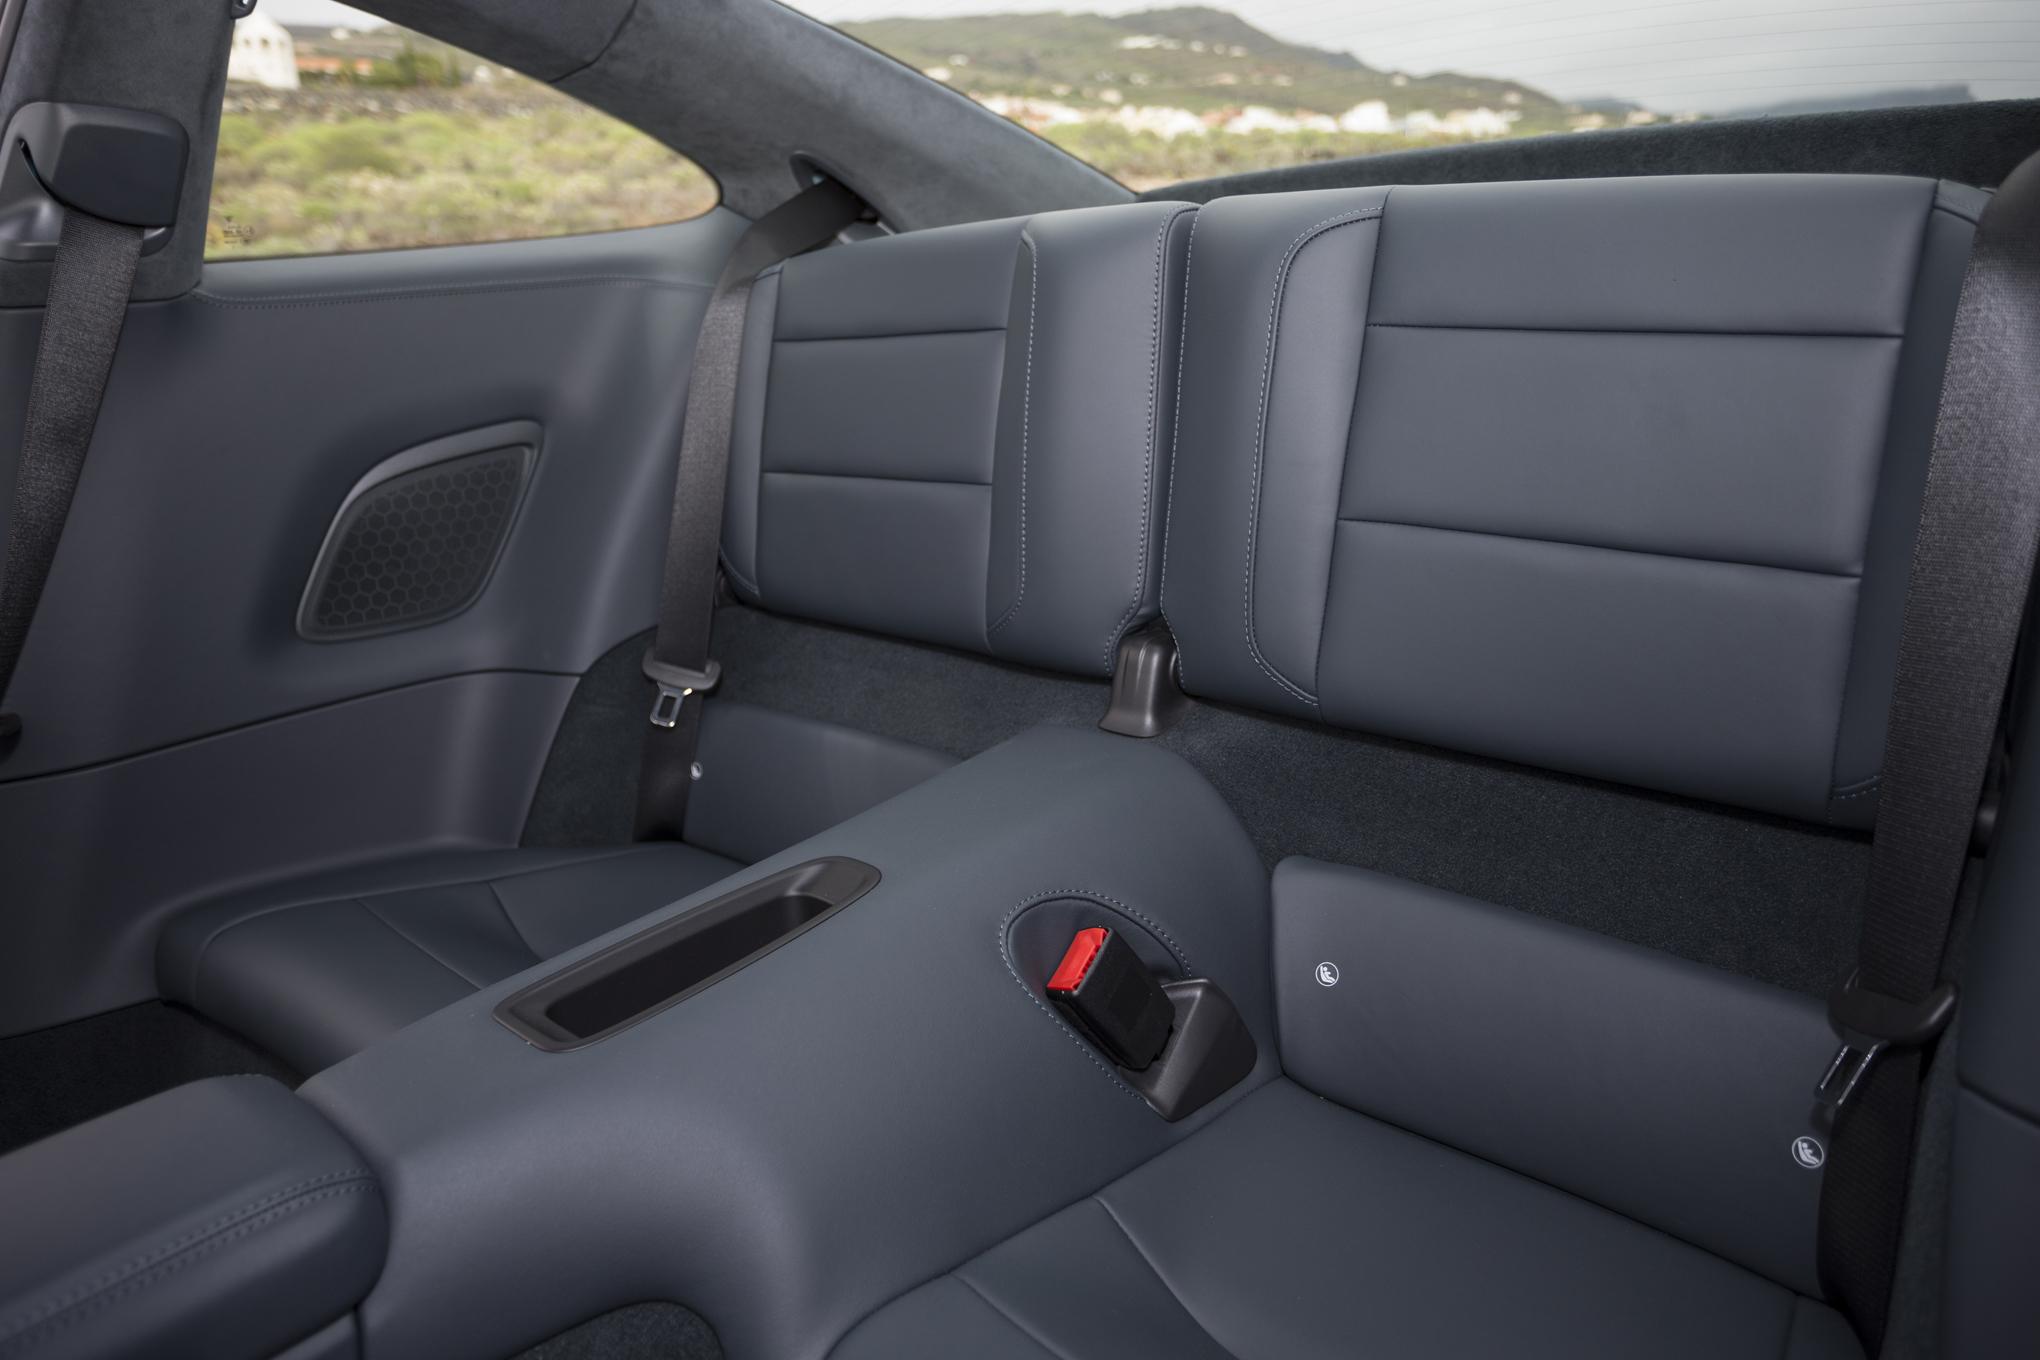 2017 Porsche 911 Carrera Seats View